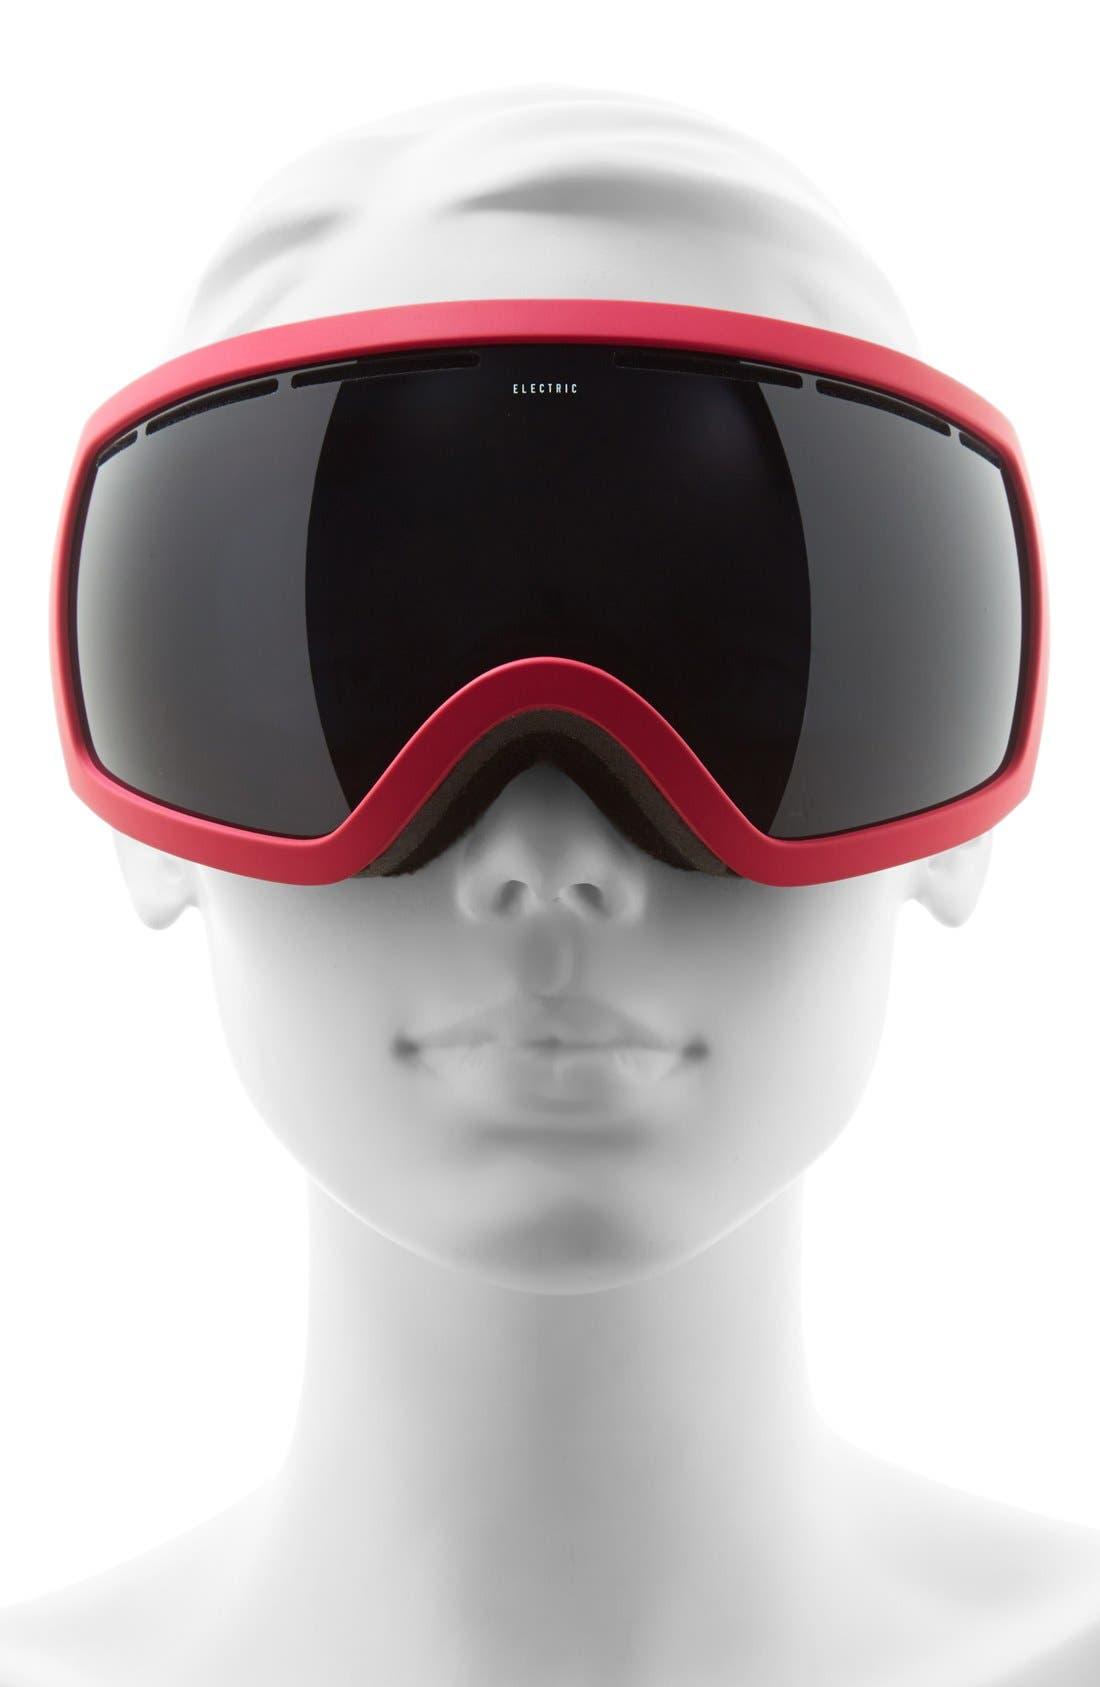 EG 2.5 215mm Snow Goggles,                             Alternate thumbnail 2, color,                             Solid Berry/ Jet Black